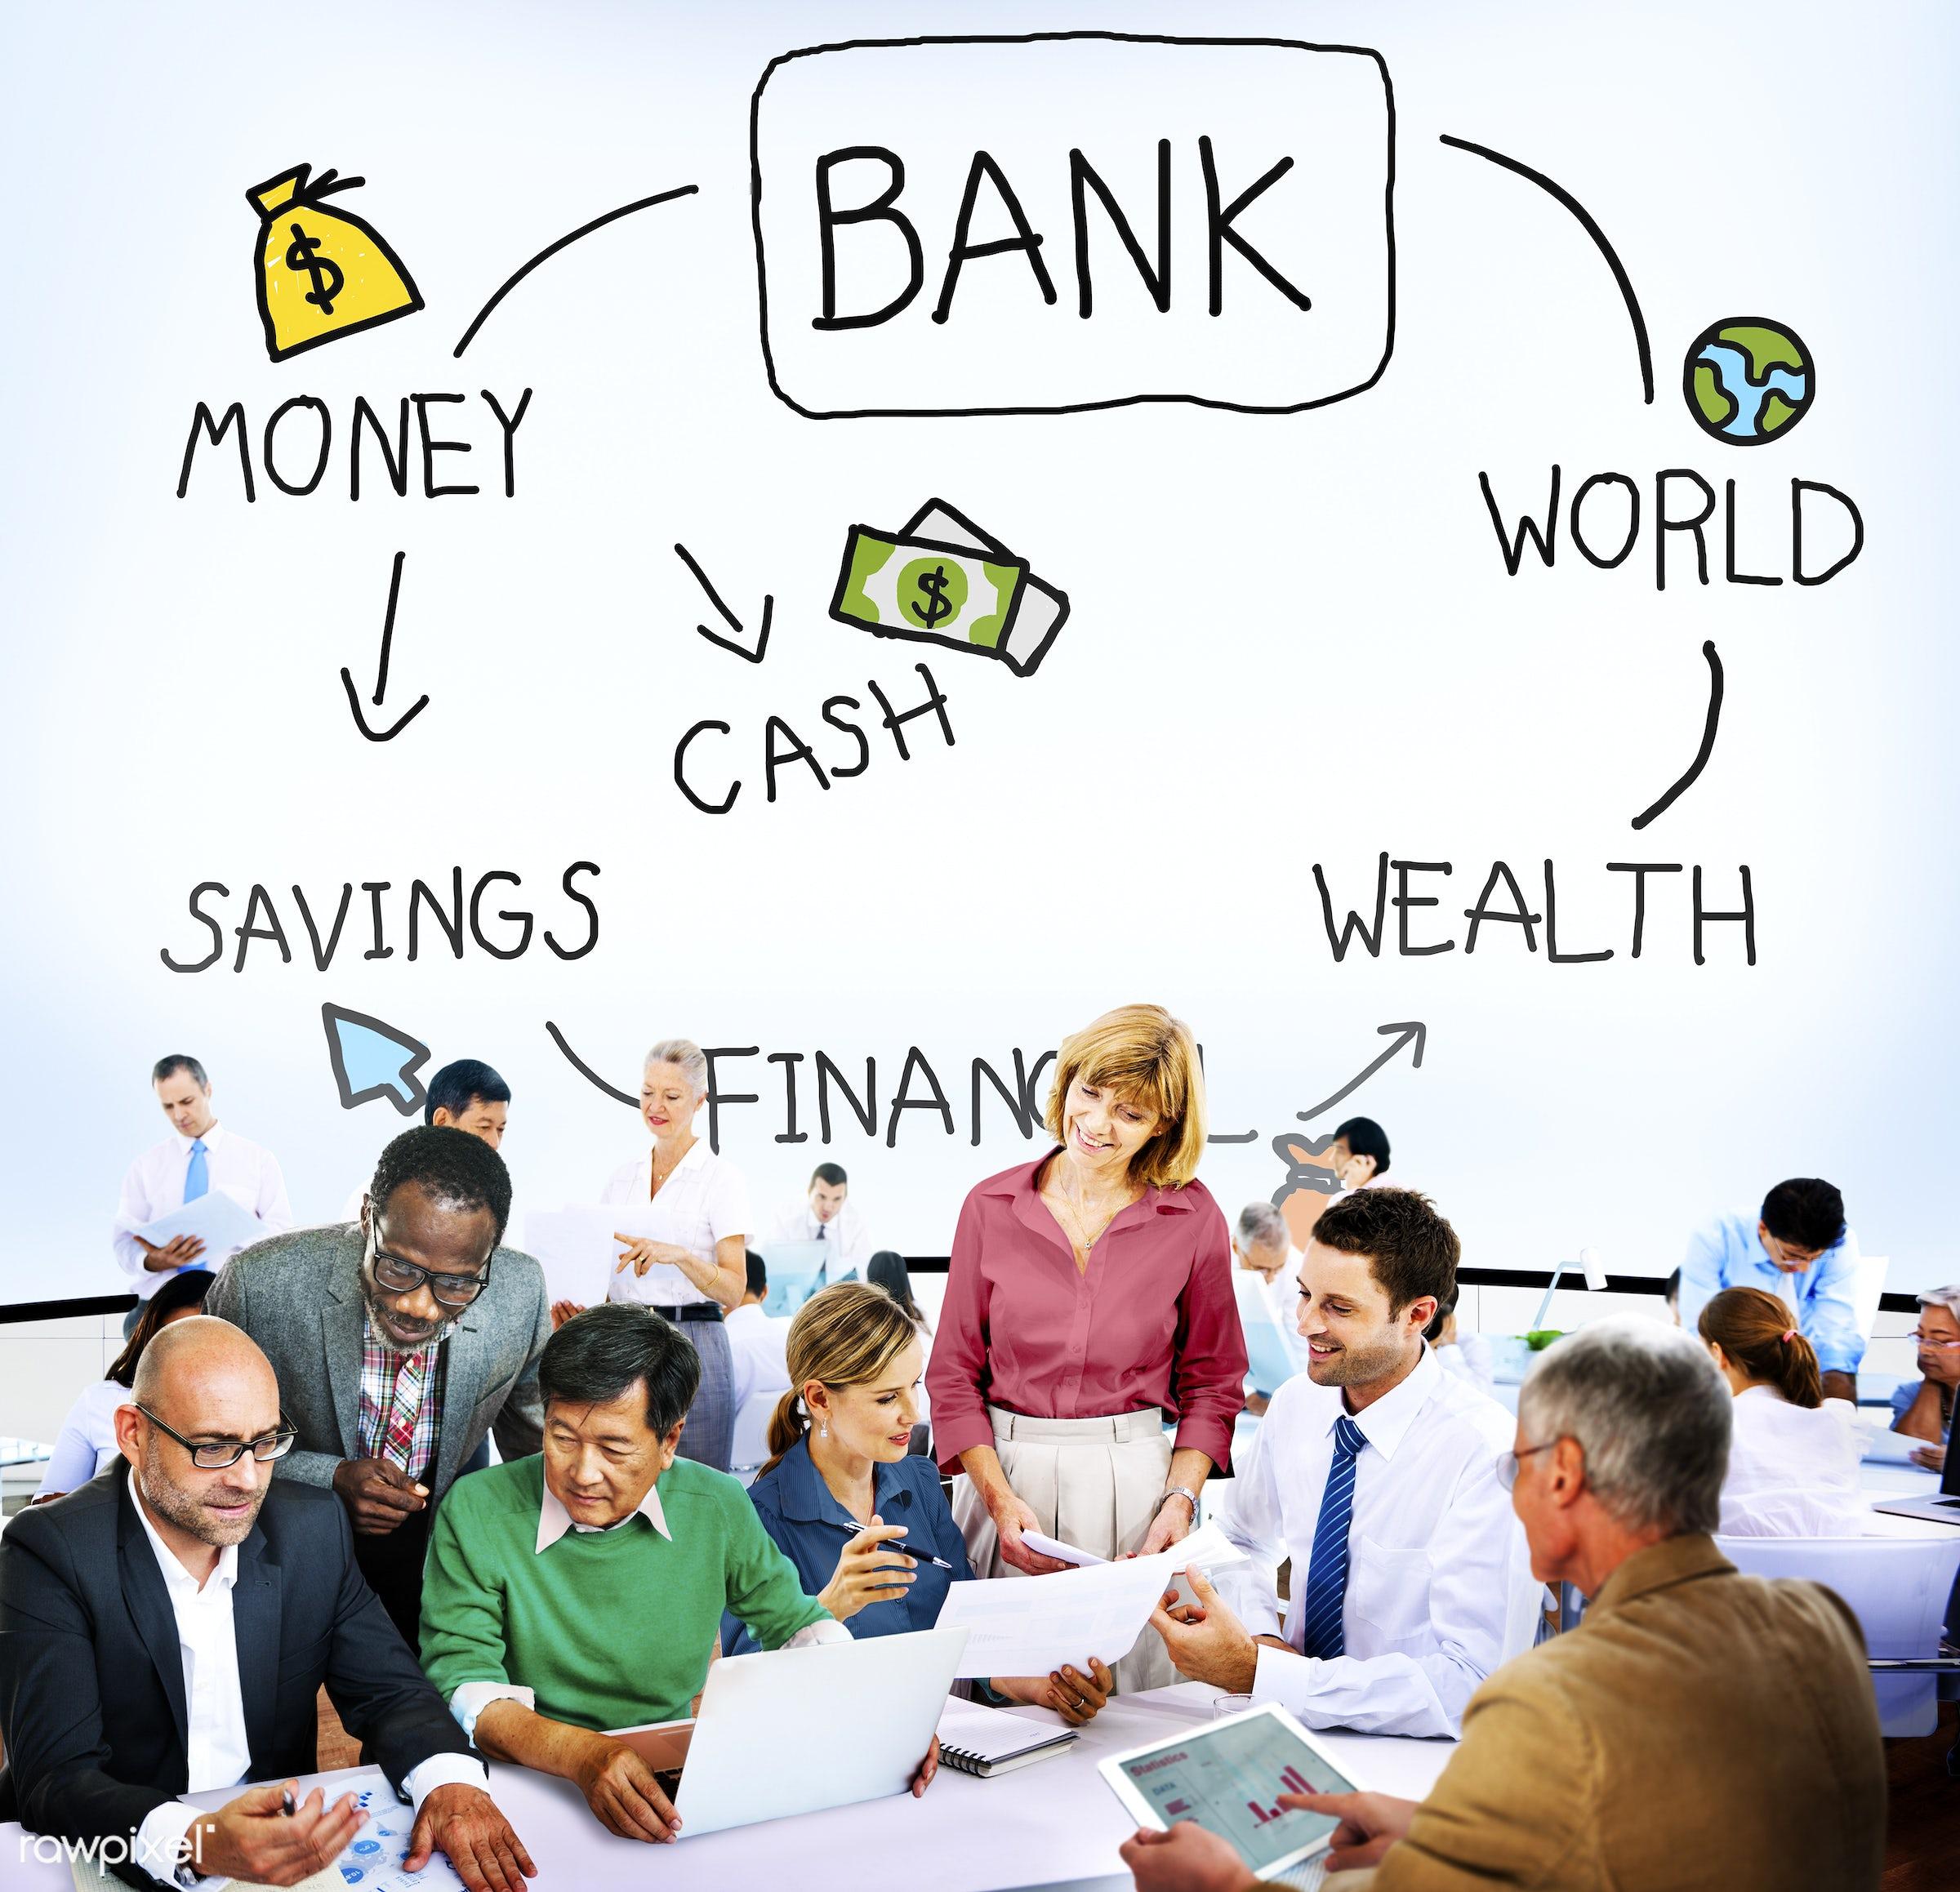 analysis, bank, banking, bankruptcy, budget, business, business people, businessmen, businesswomen, busy, communication,...